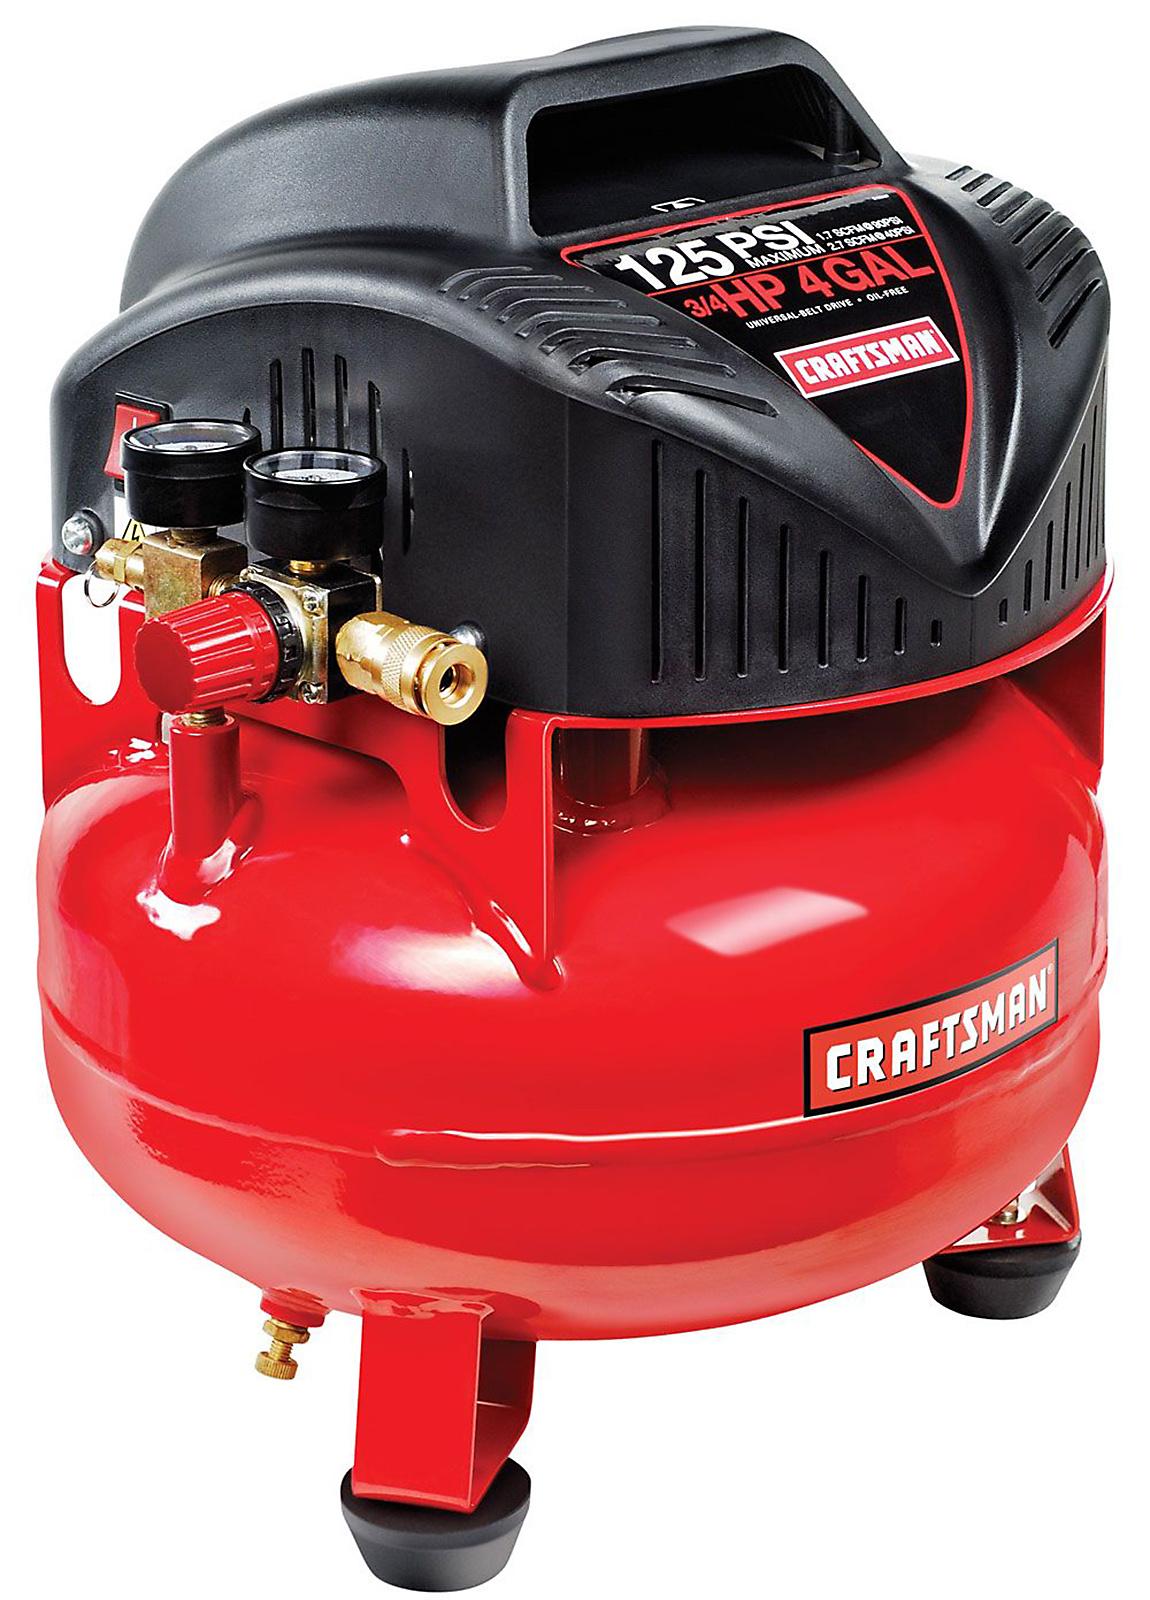 Craftsman 4 Gallon 0.75 Hp Oil-free Pancake Air Compressor